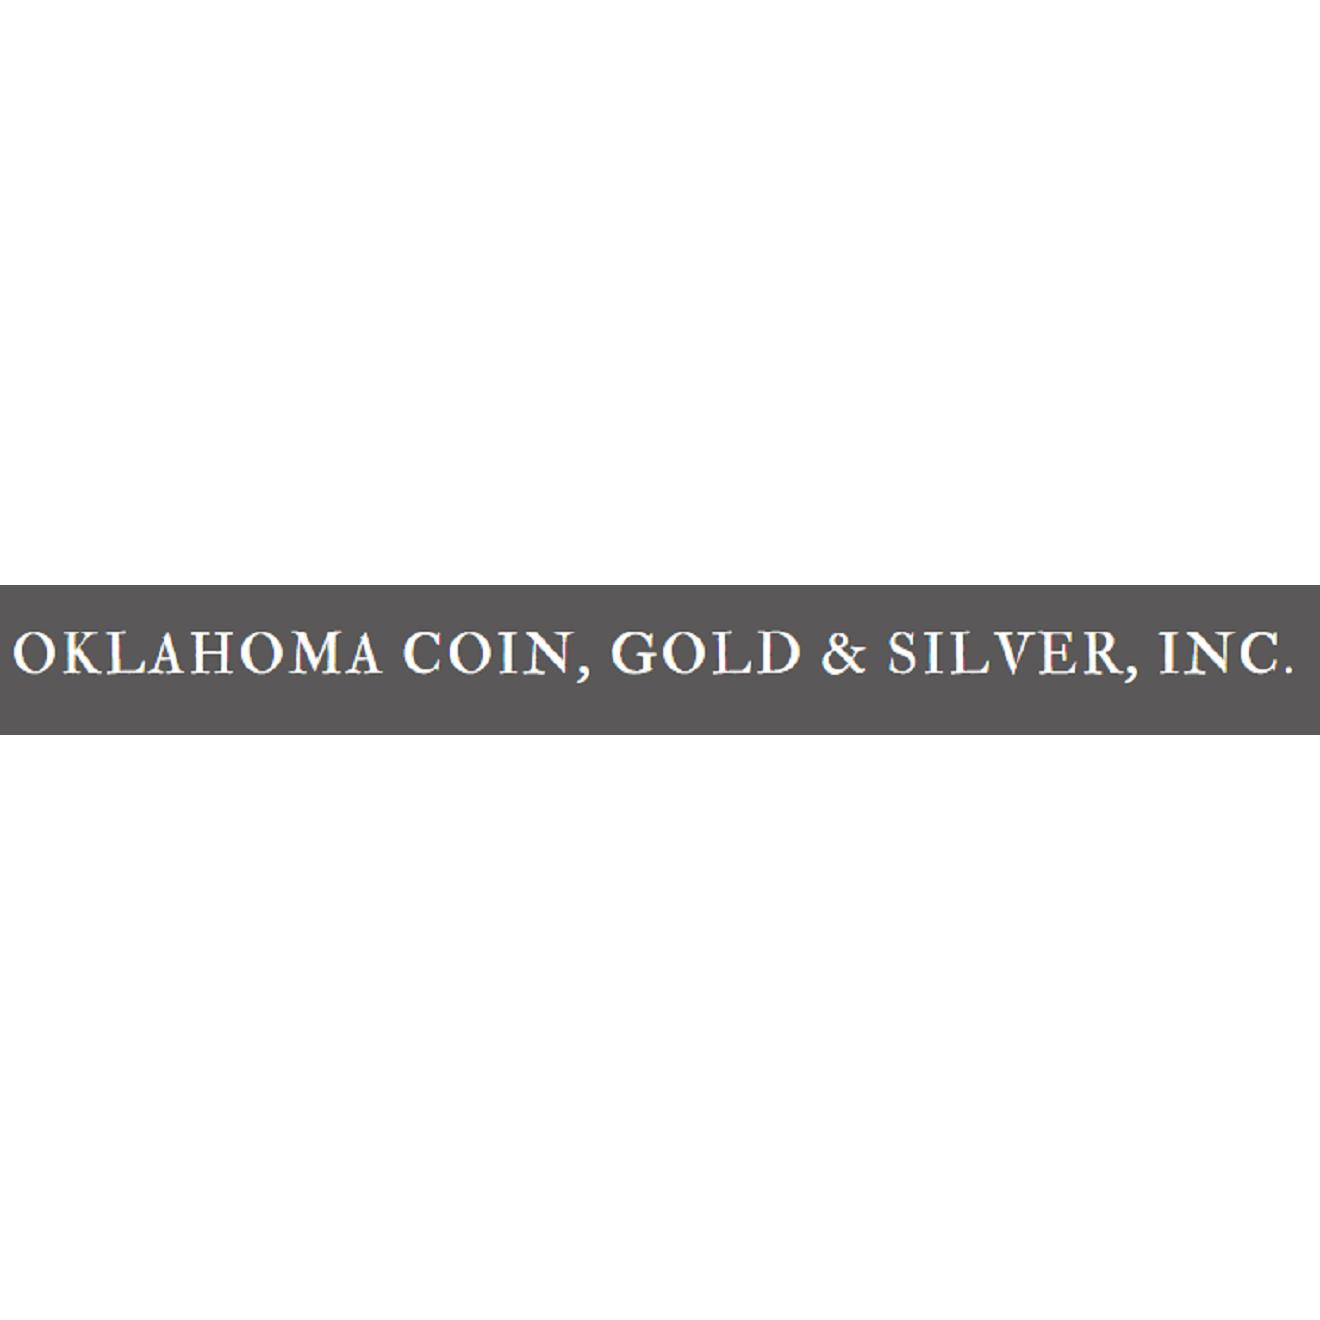 Oklahoma Coin, Gold & Silver Inc - Oklahoma City, OK - Coins & Stamps